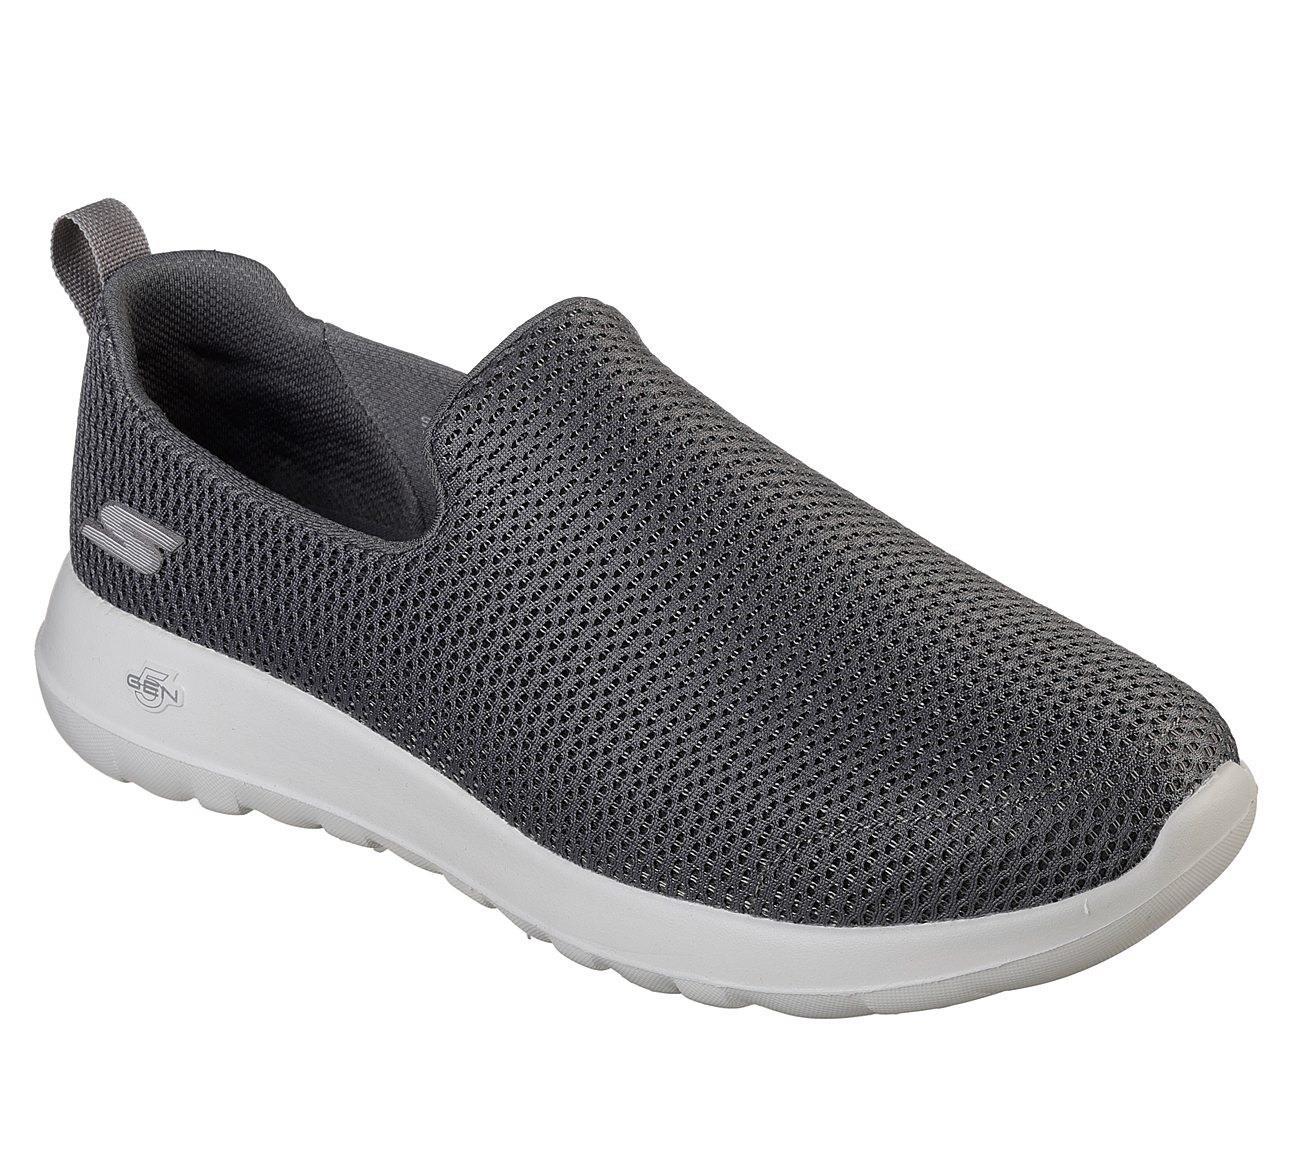 Shoes Men's Shoes Skechers Mens Go Walk Max Slip On Trainers